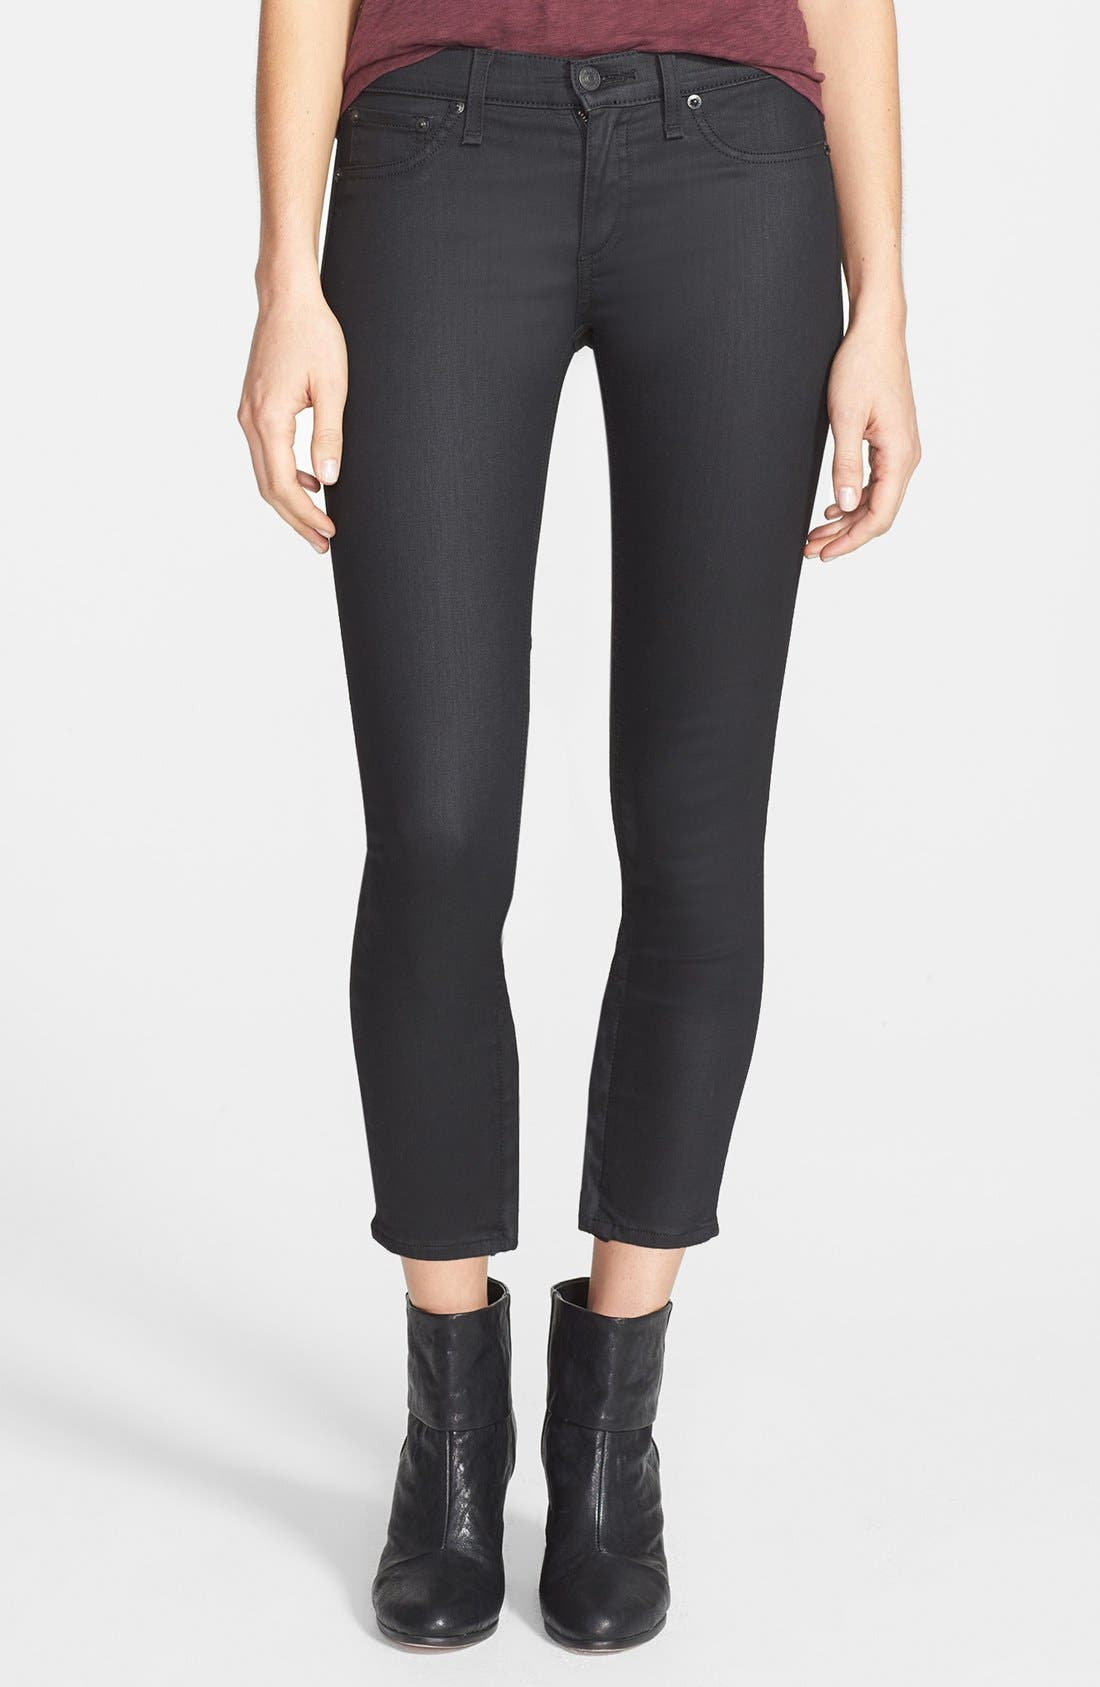 Alternate Image 1 Selected - rag & bone/JEAN Coated Zip Cuff Crop Jeans (Cotswald)